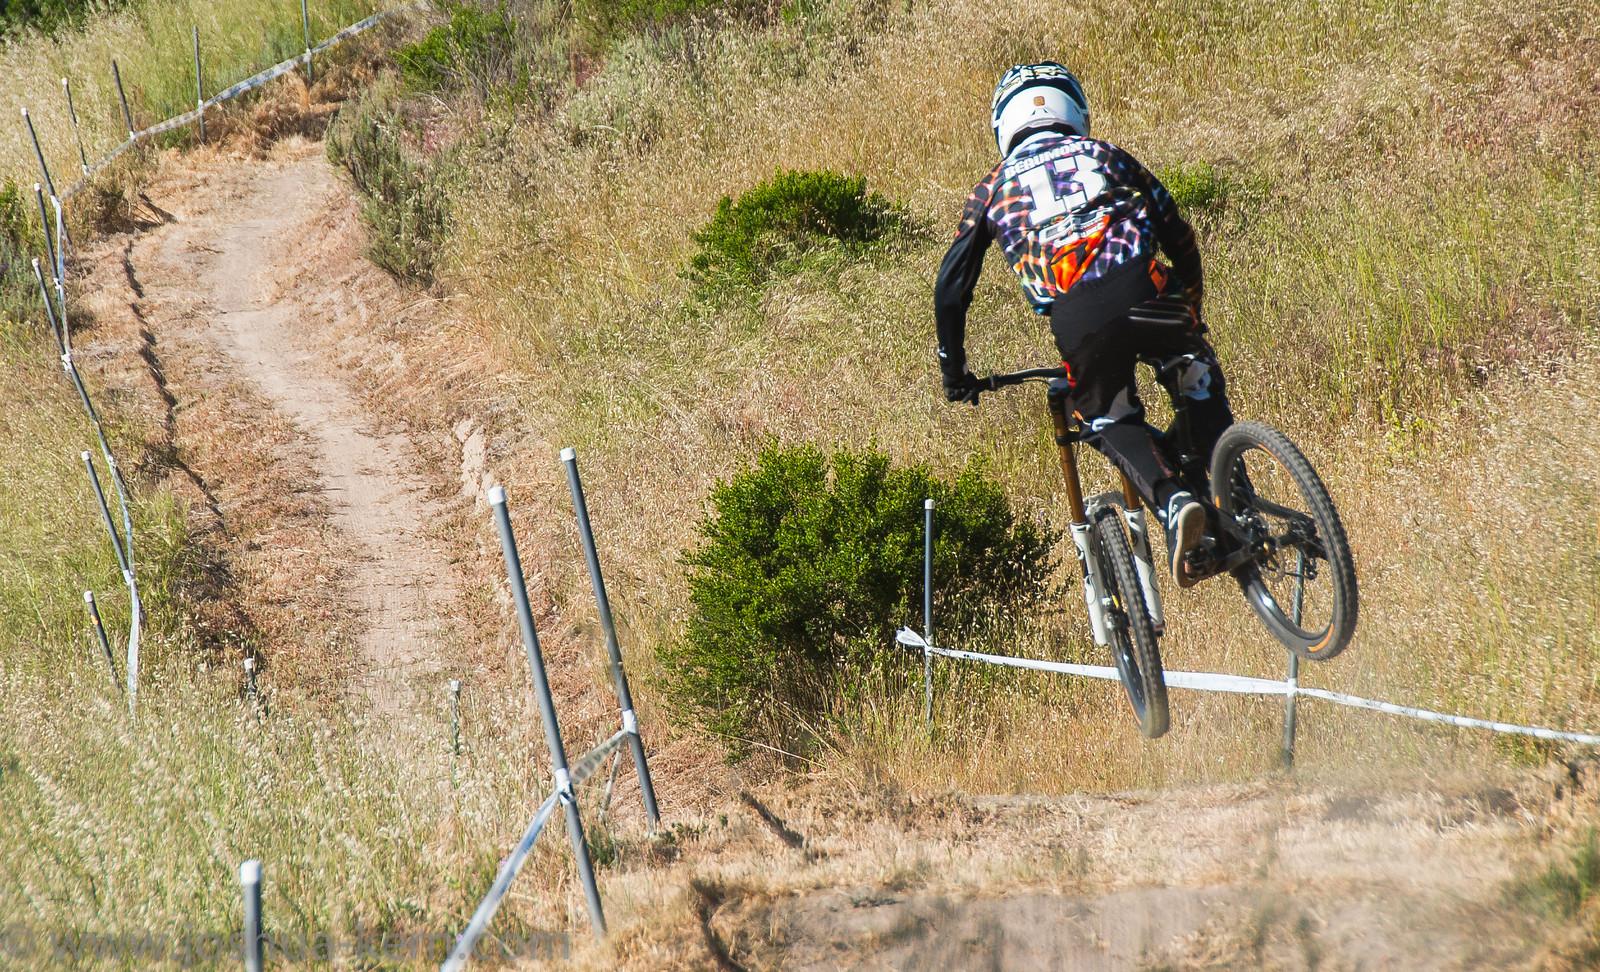 4-18-13DHPractice (4 of 17) - jkern620 - Mountain Biking Pictures - Vital MTB